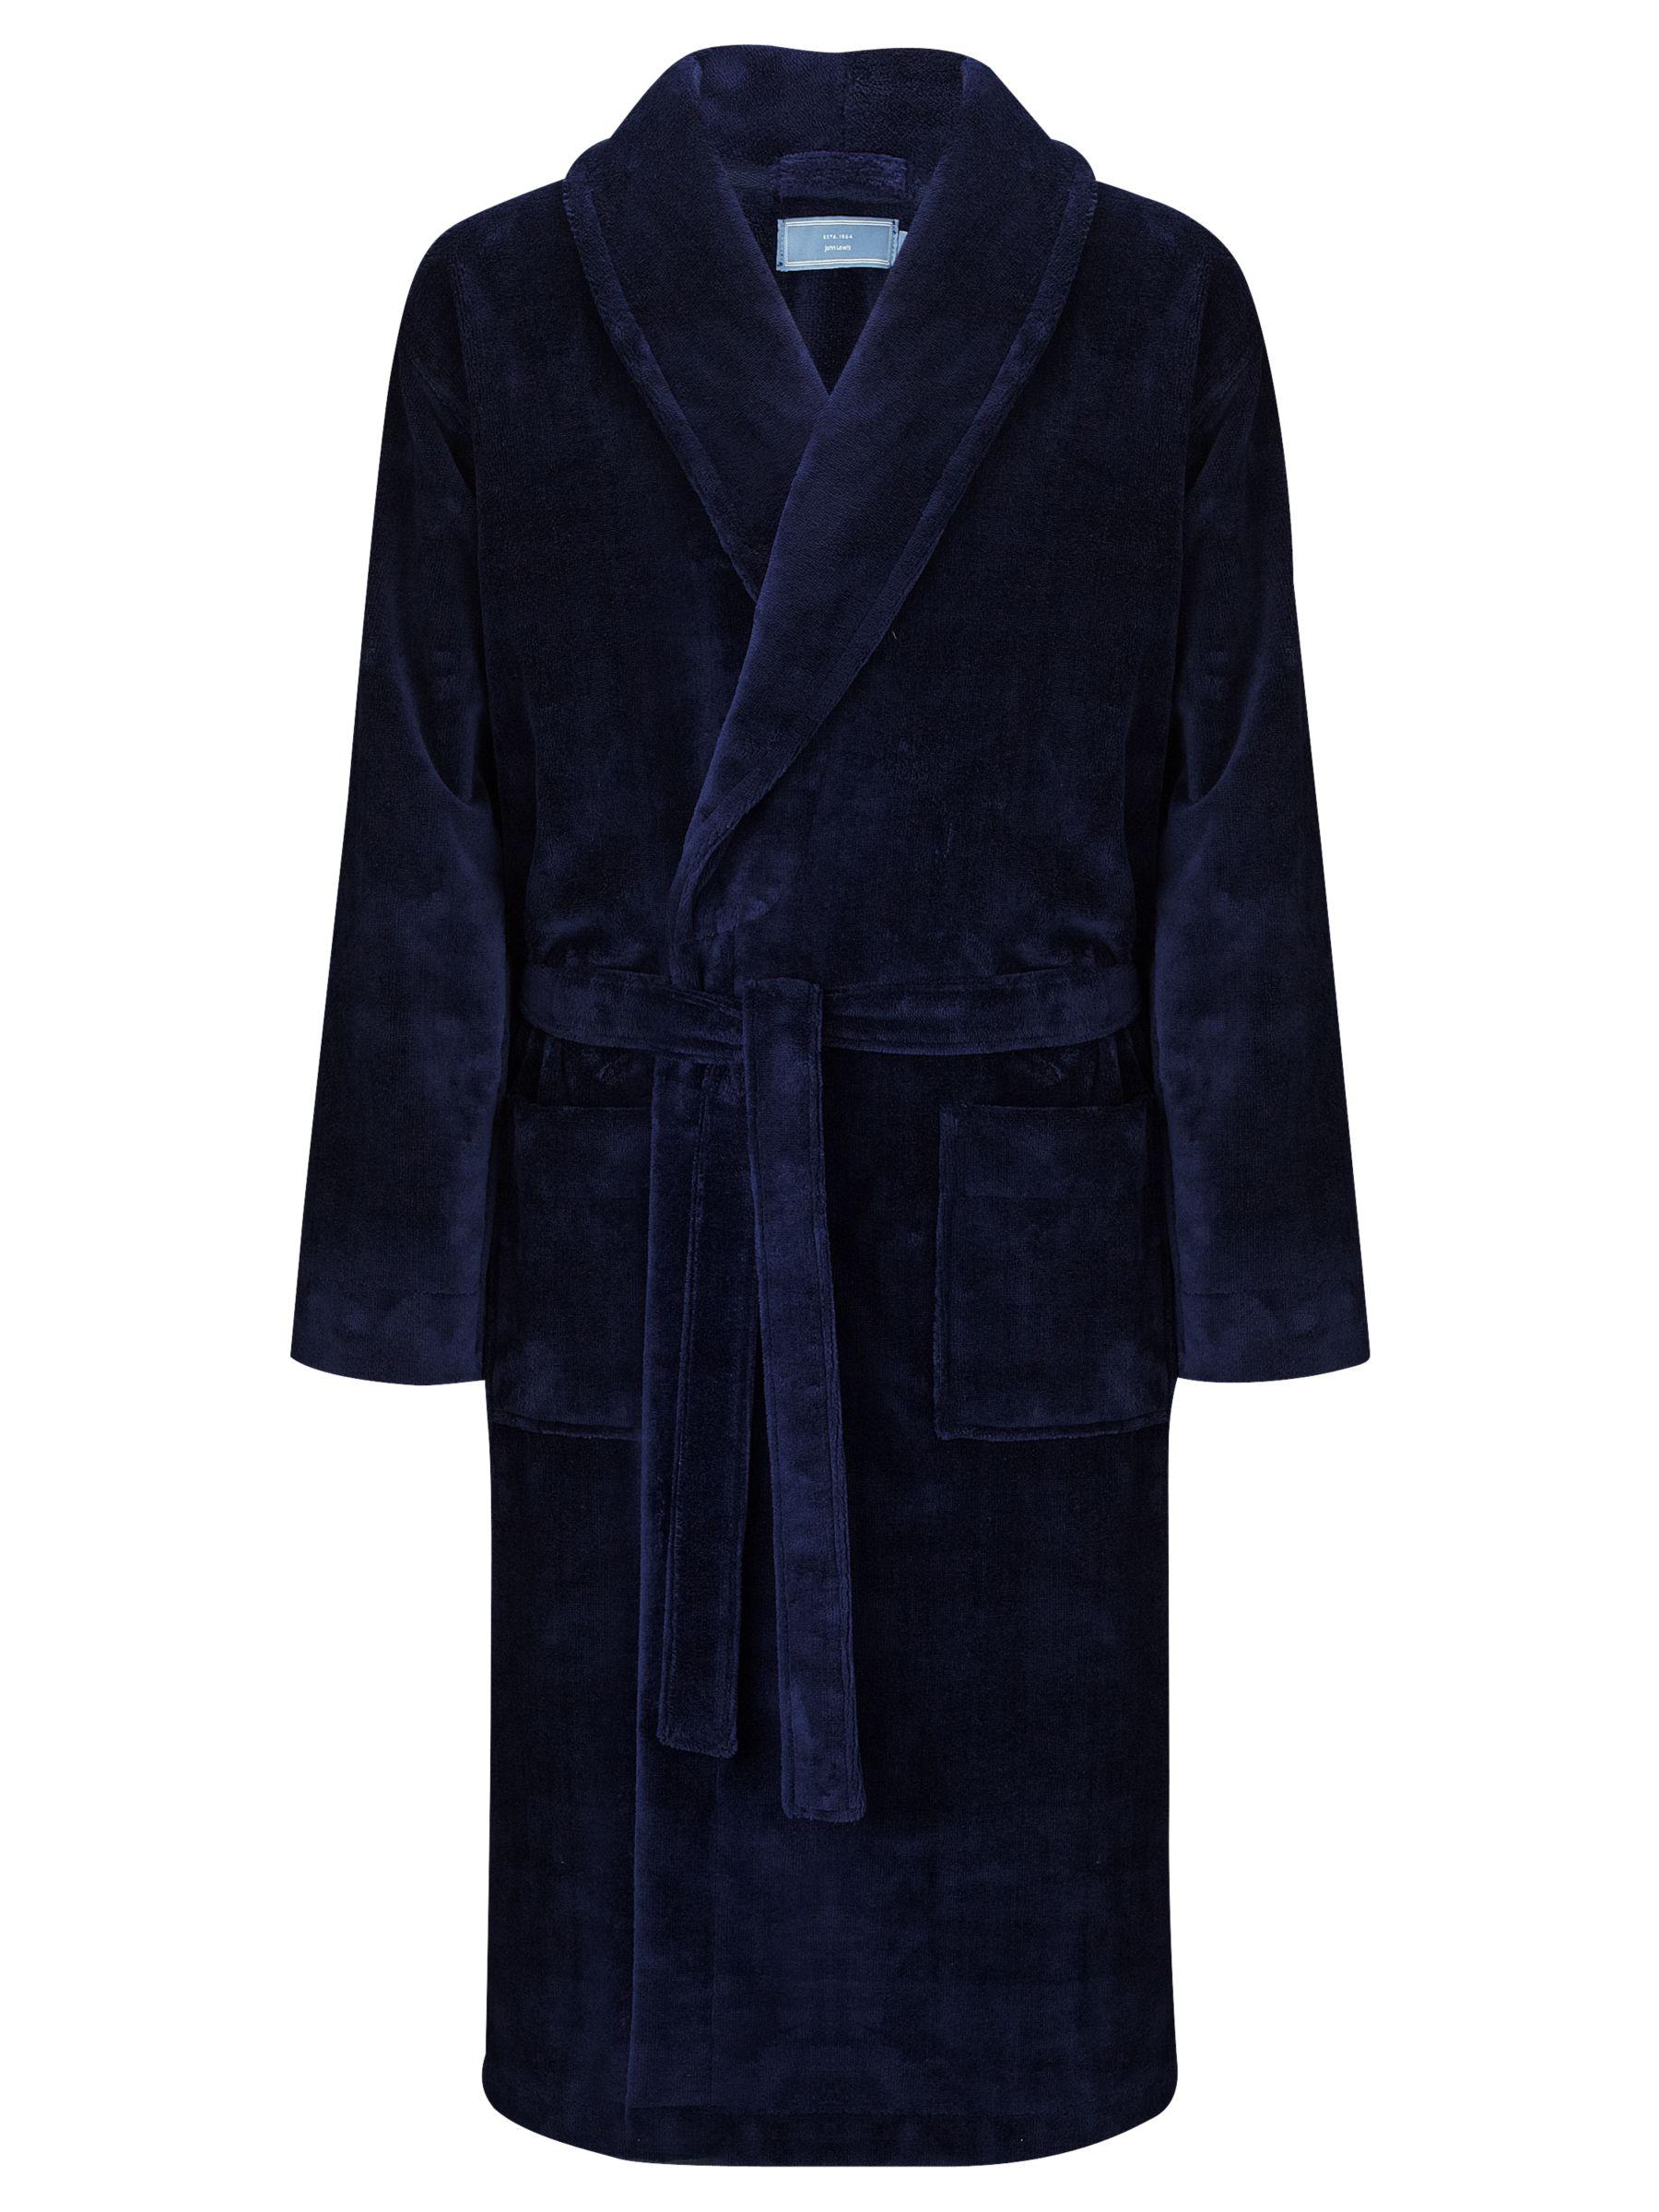 John Lewis Super Soft Towel Robe, Navy